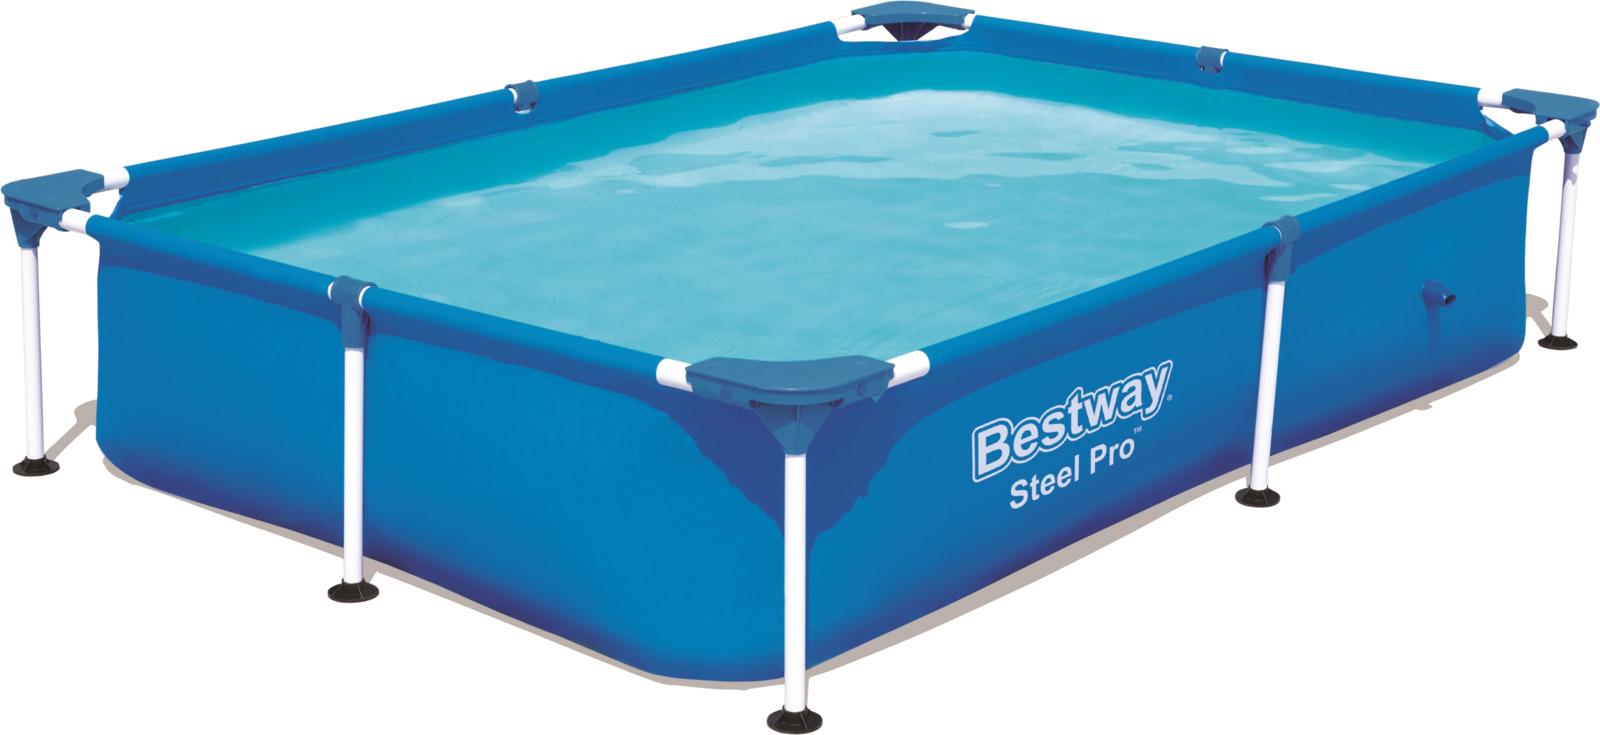 Бассейн каркасный Bestway Steel Pro, 1200 л бассейн каркасный polygroup p20 1248 s 366х122 см